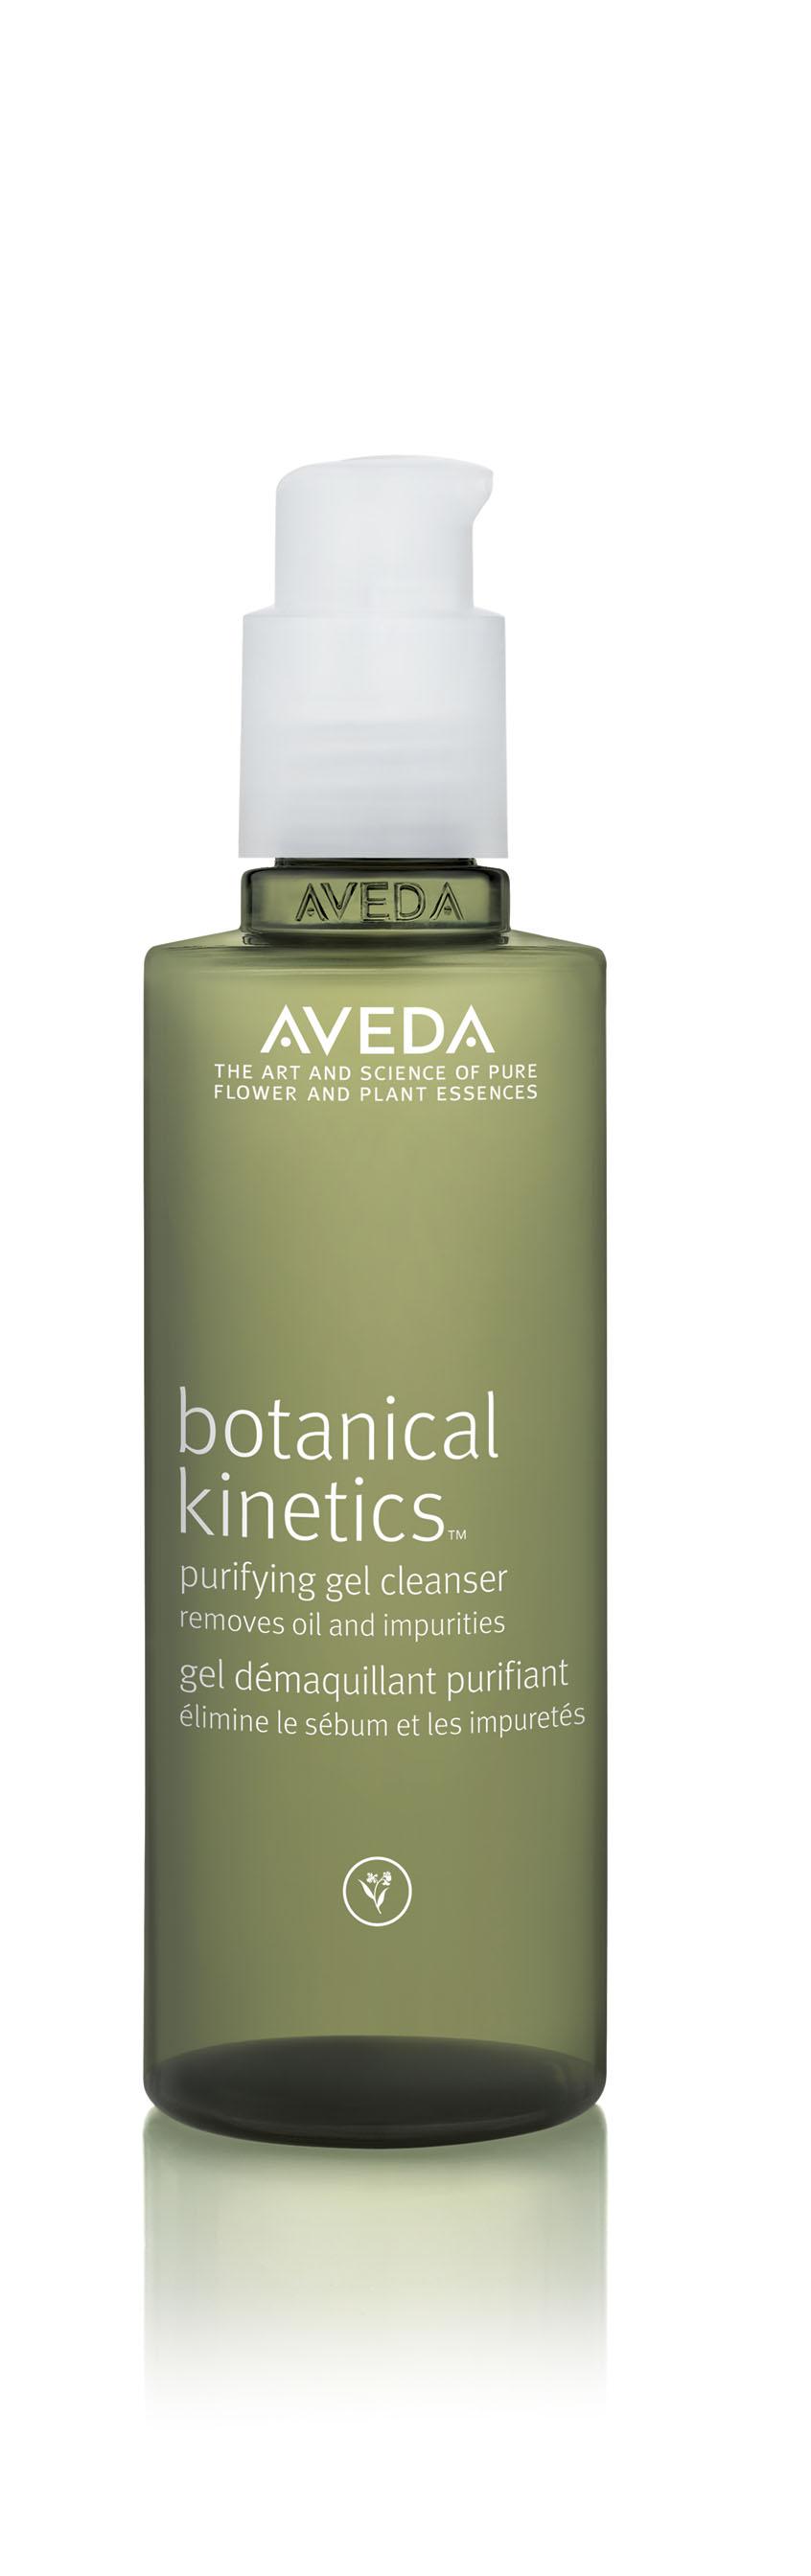 AVEDA bayviewvillage Natural organic skincare